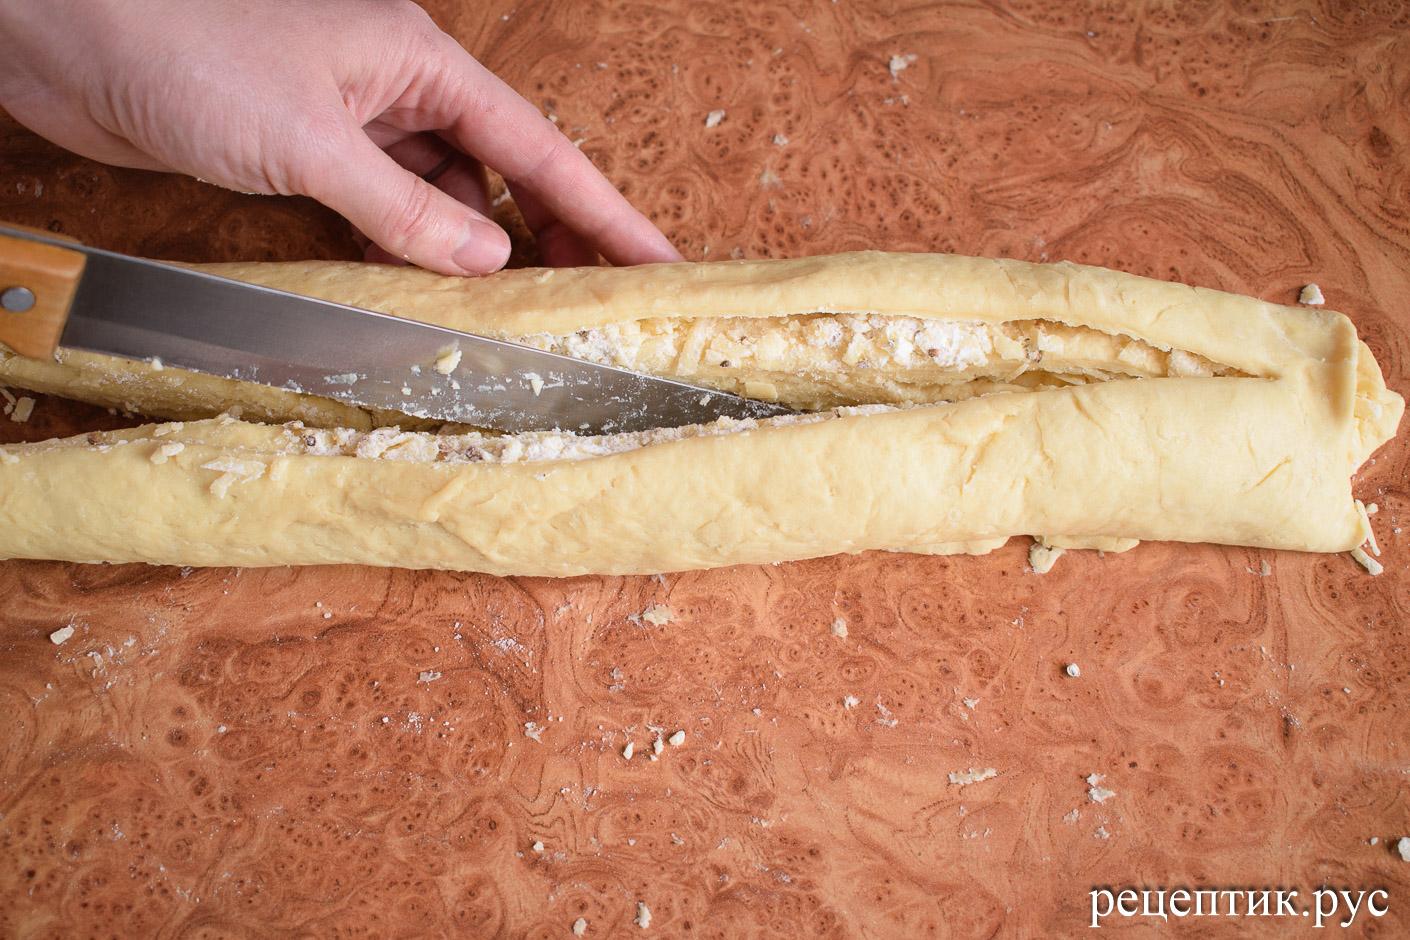 Дрожжевая булка с сыром - рецепт с фото, шаг 10